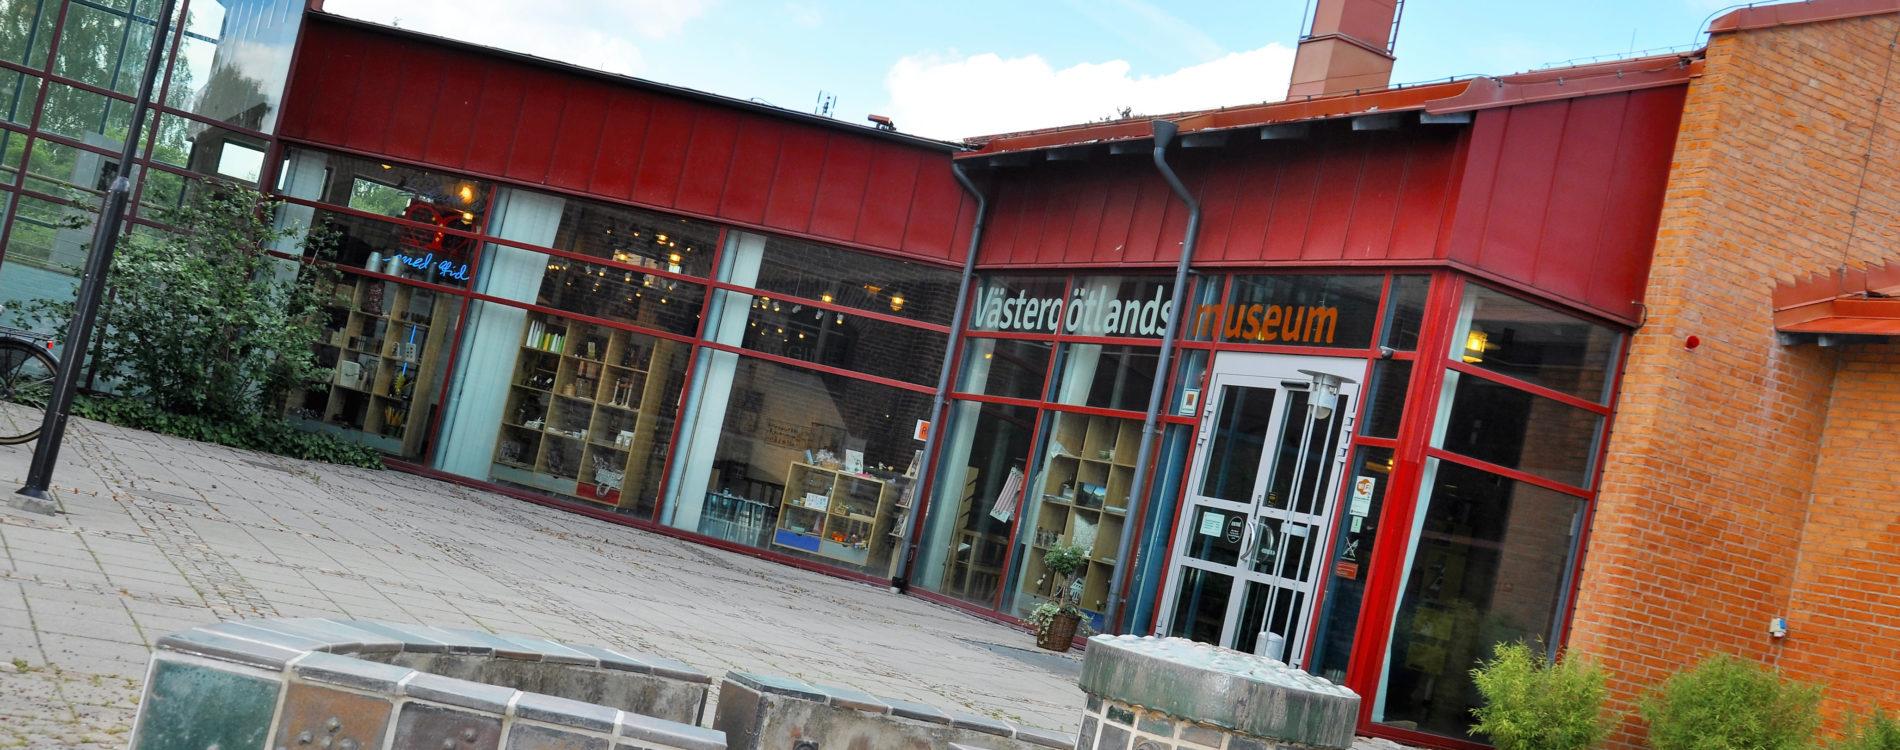 Västergötlands Museums entré